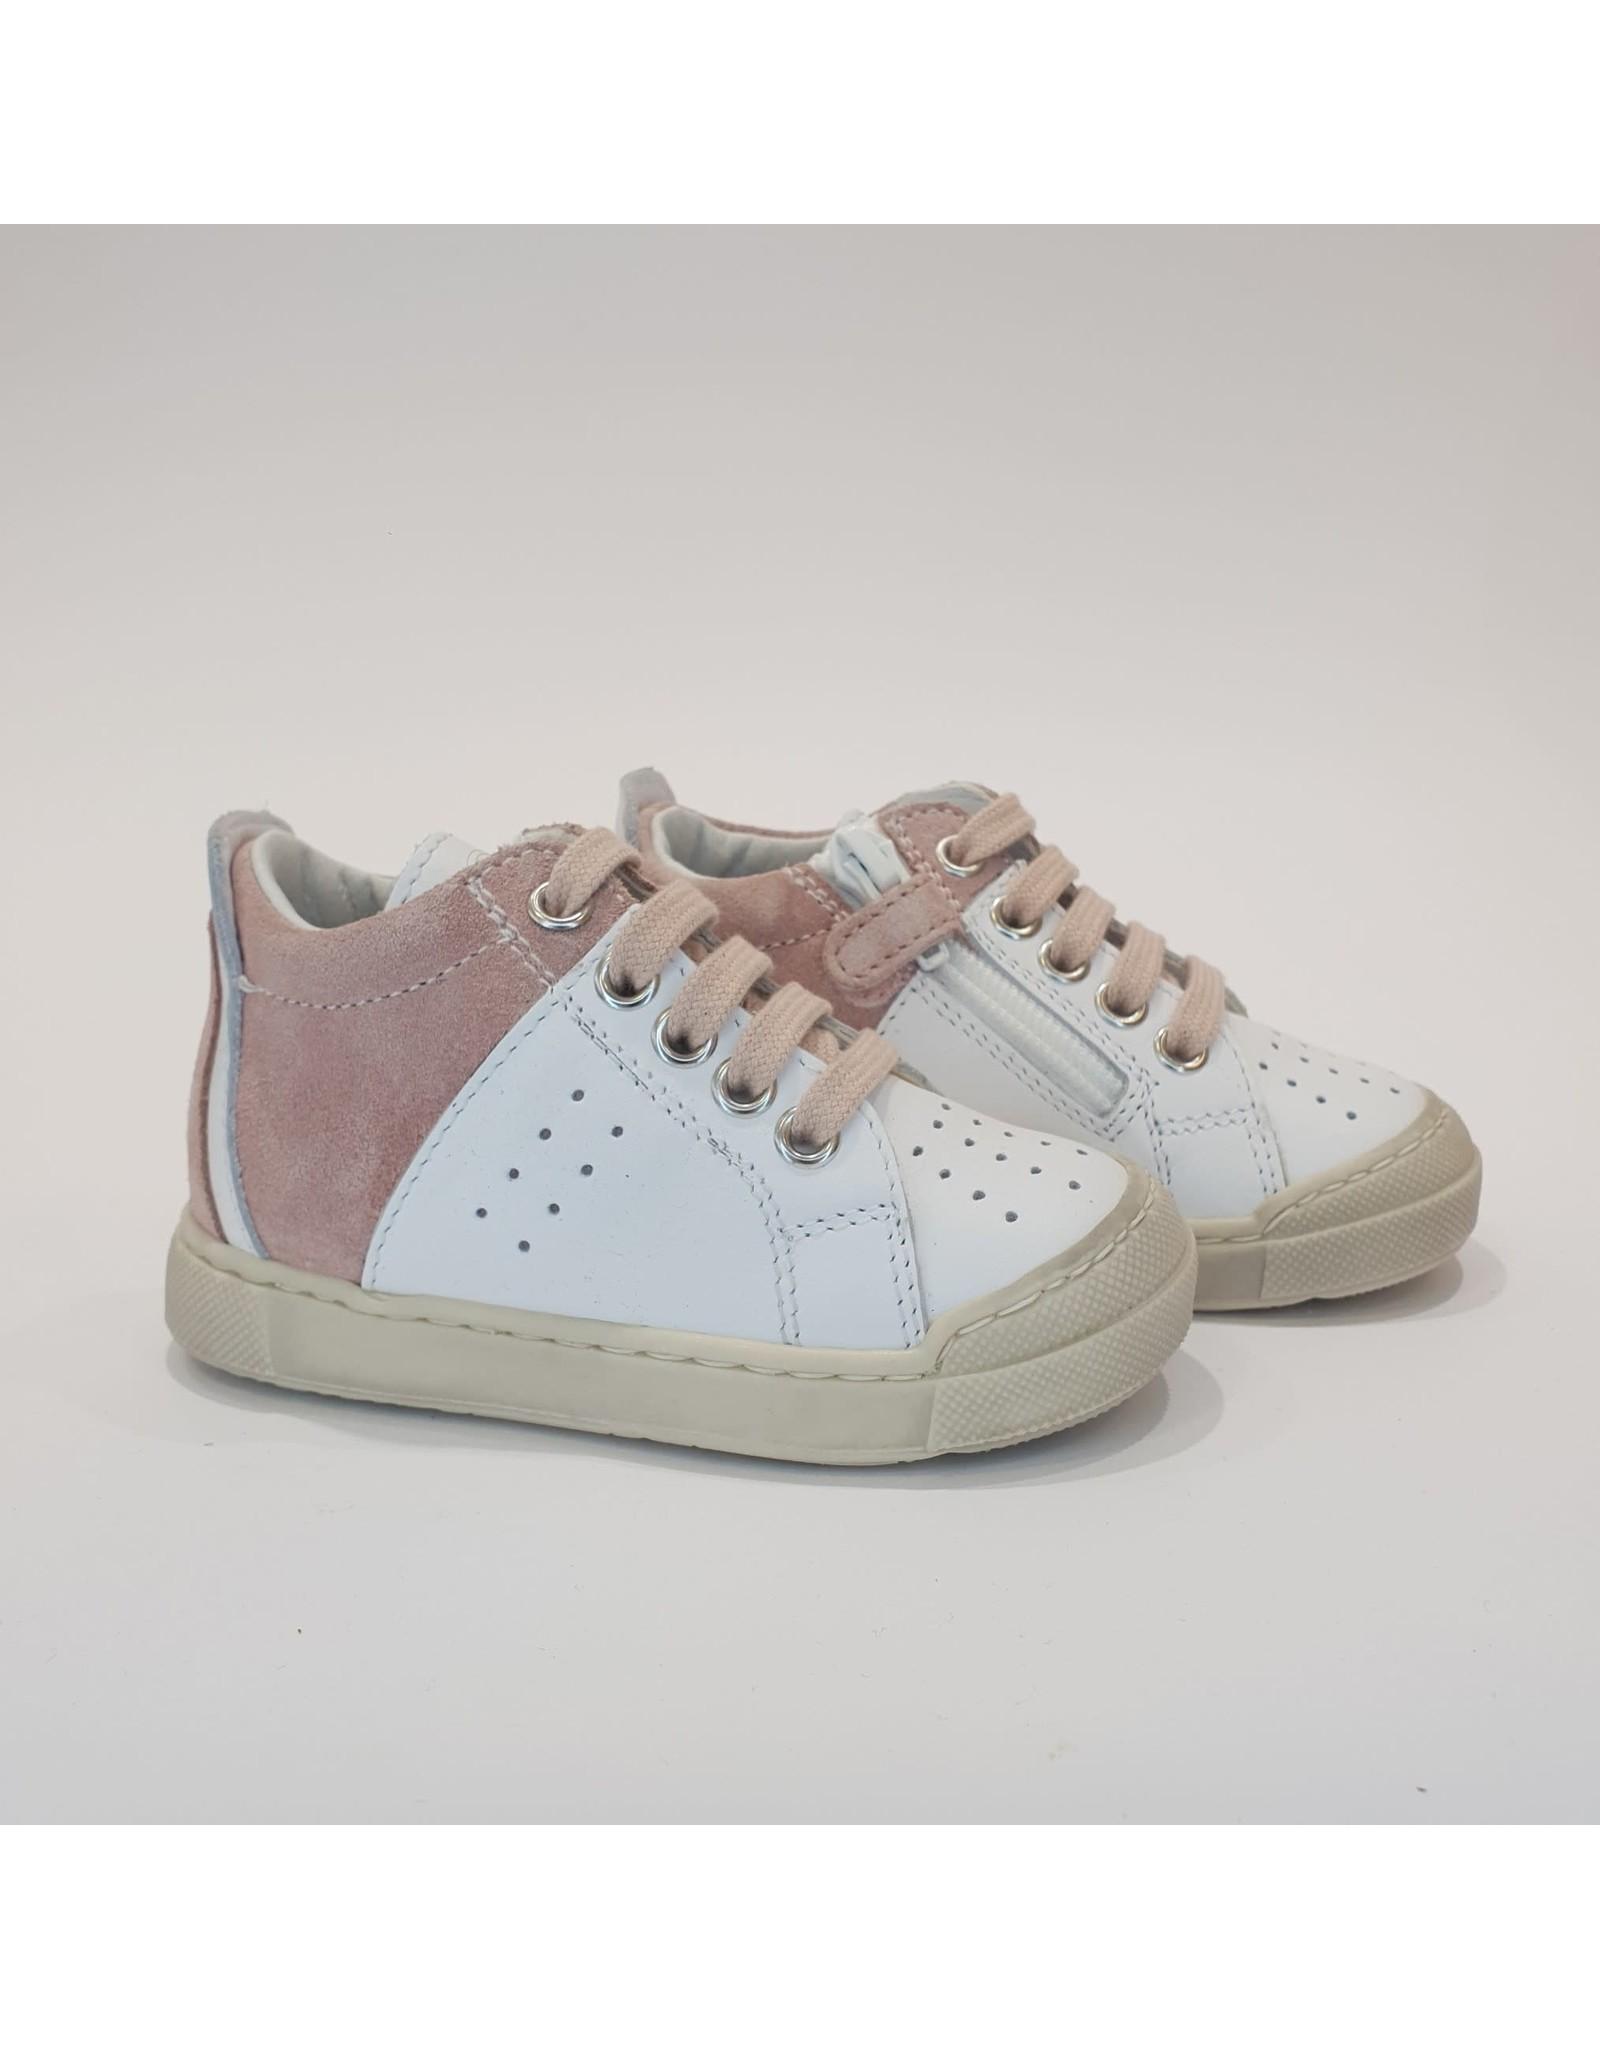 Falcotto sneaker fabron white pink